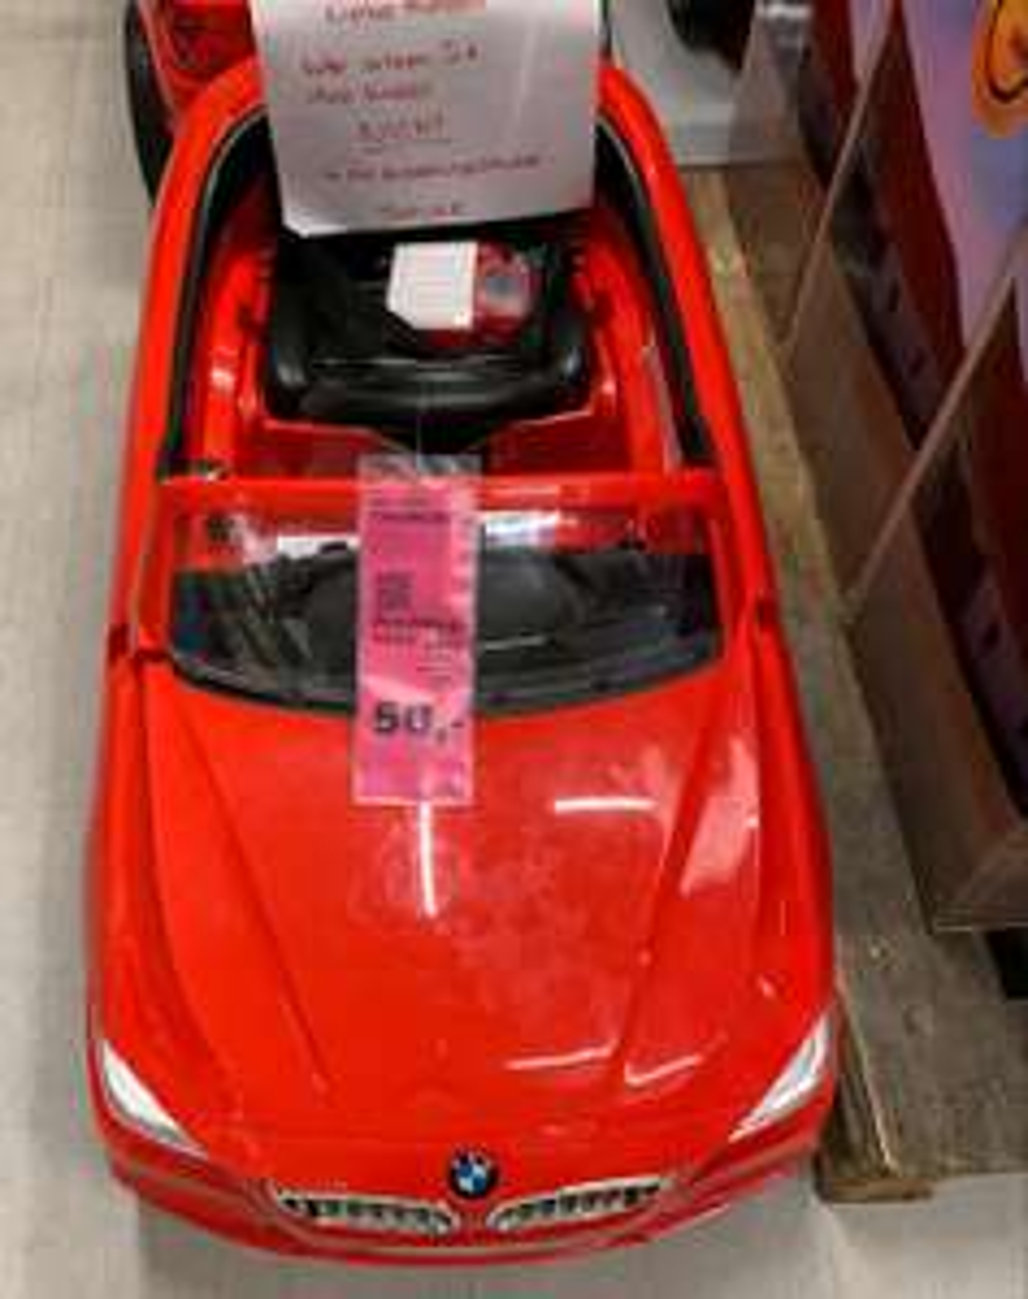 Carina BMW rot Spielzeugauto Ausstellungsstück Mömax Lokal in Darmstadt